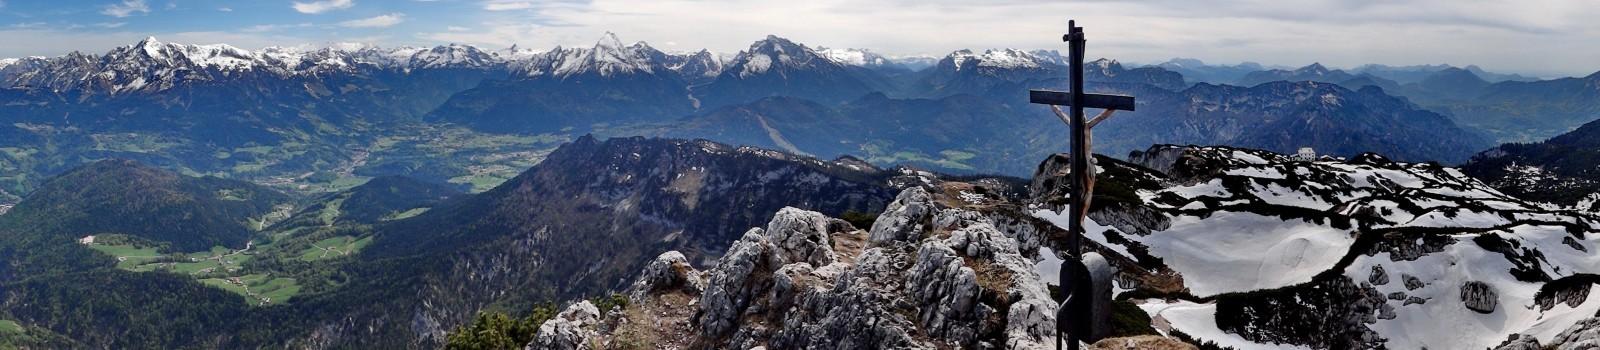 Region in Berchtesgaden